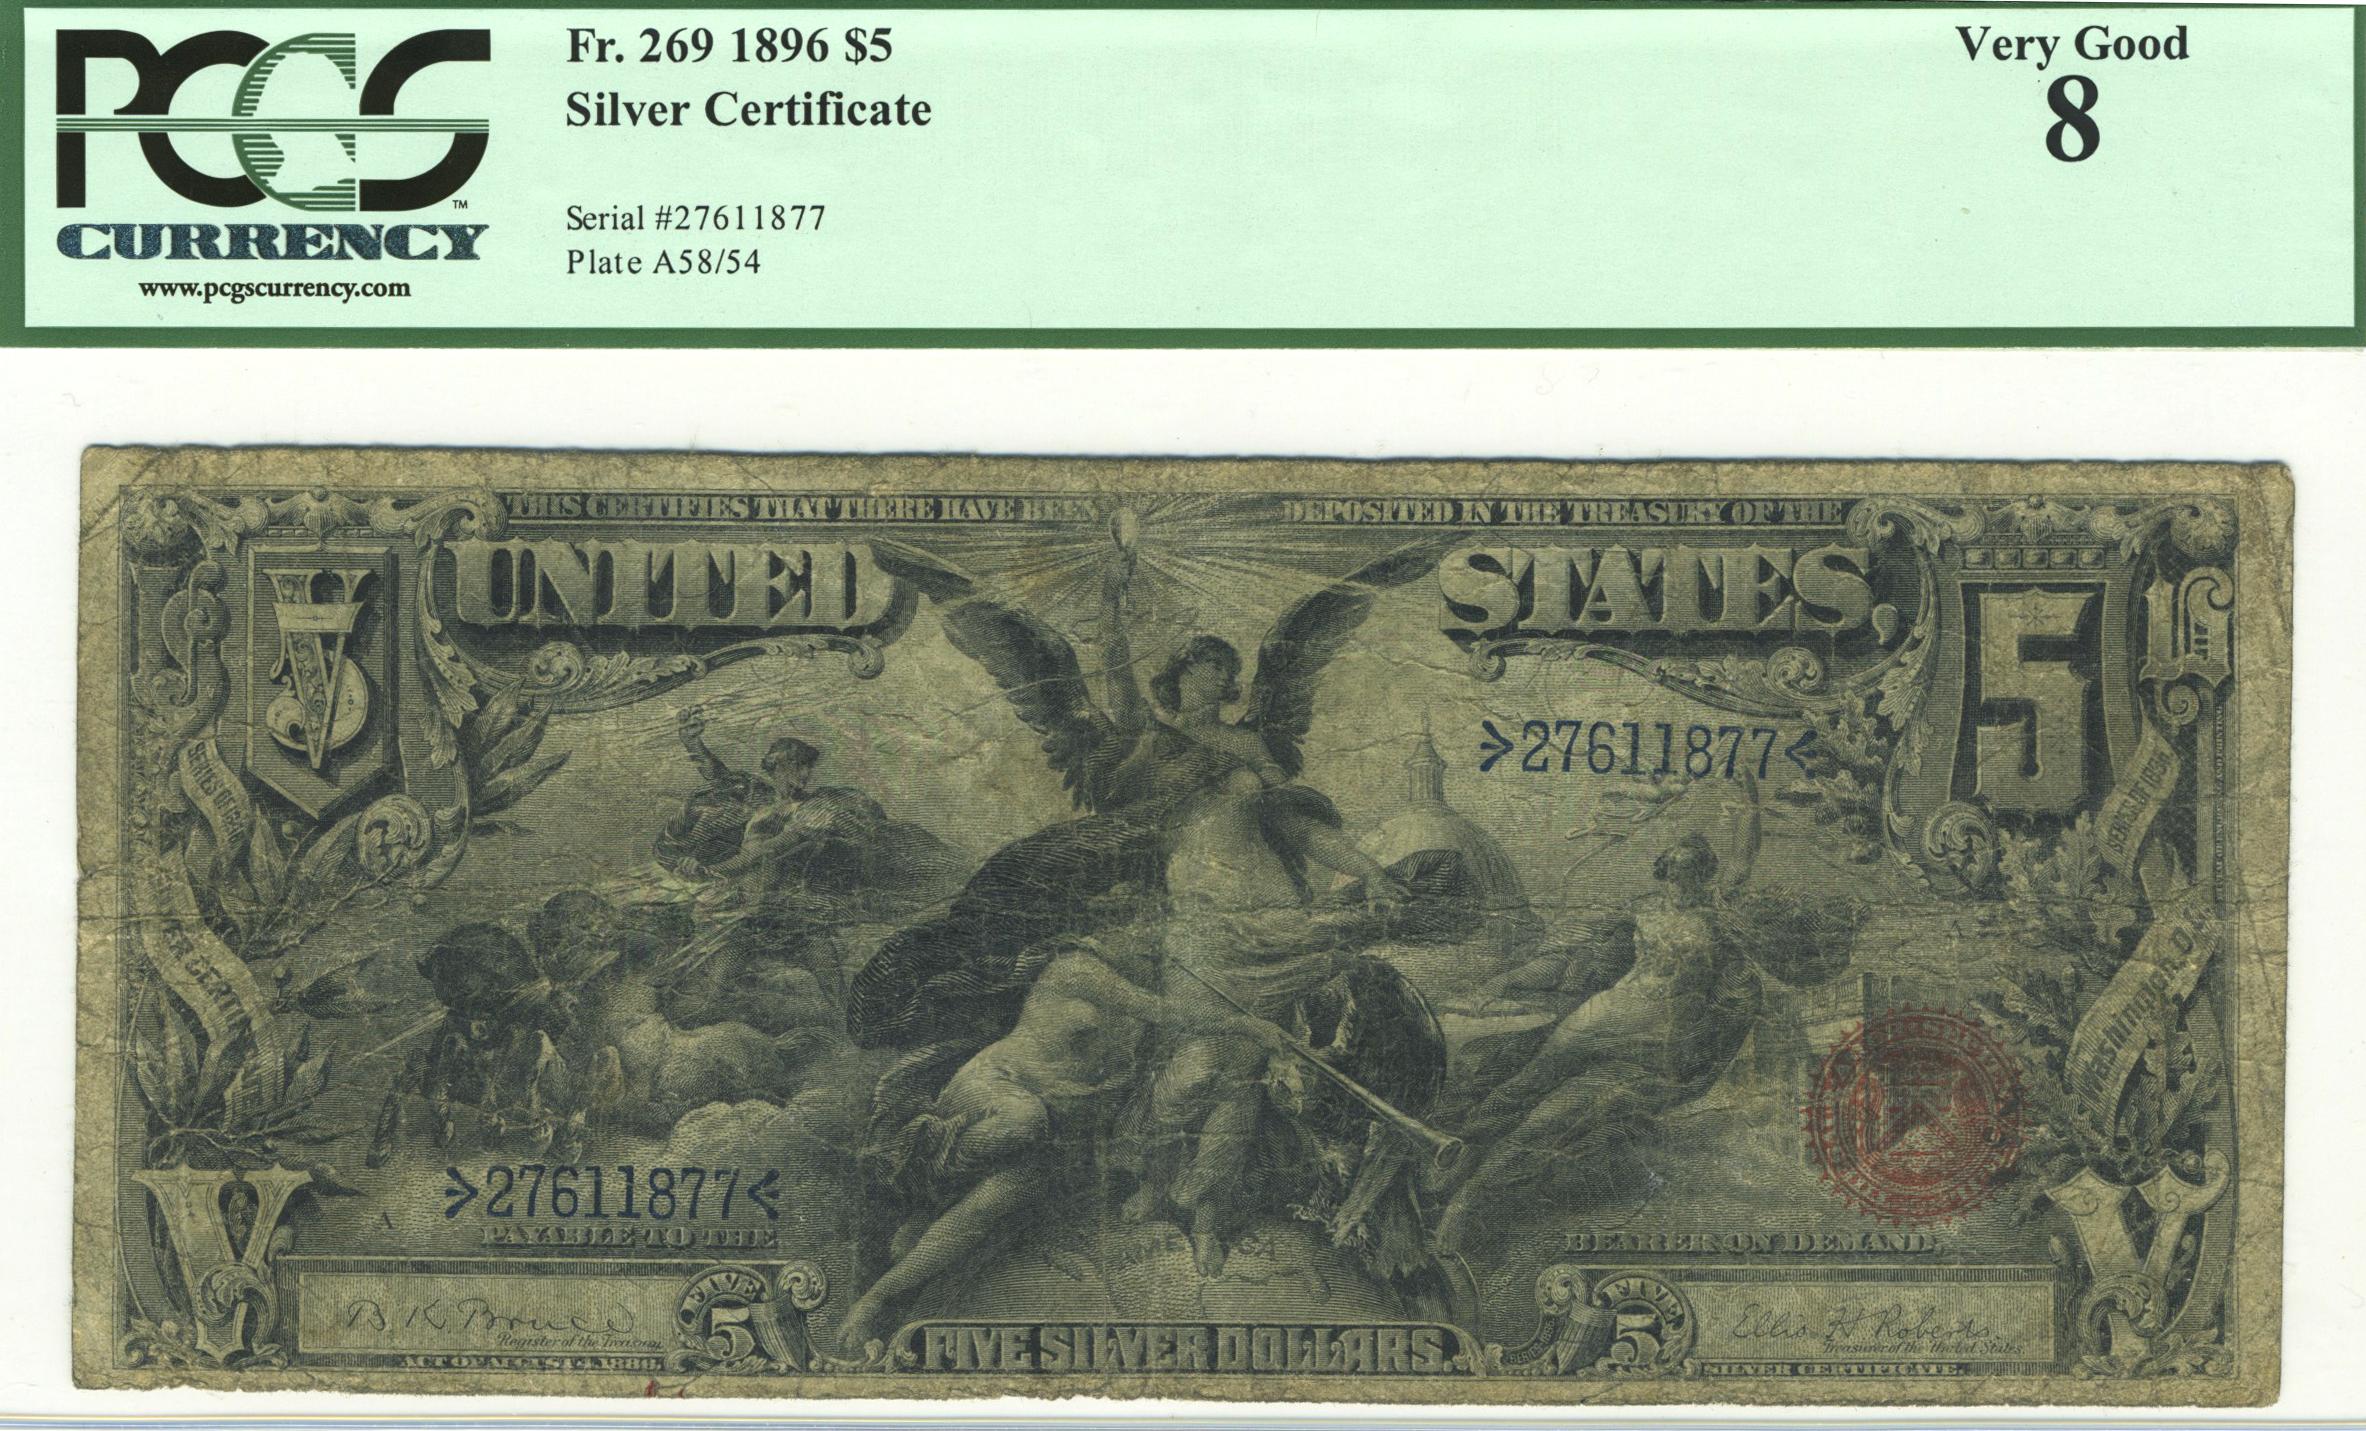 Lot 145 Fr 269 1896 5 Silver Certificate Manifest